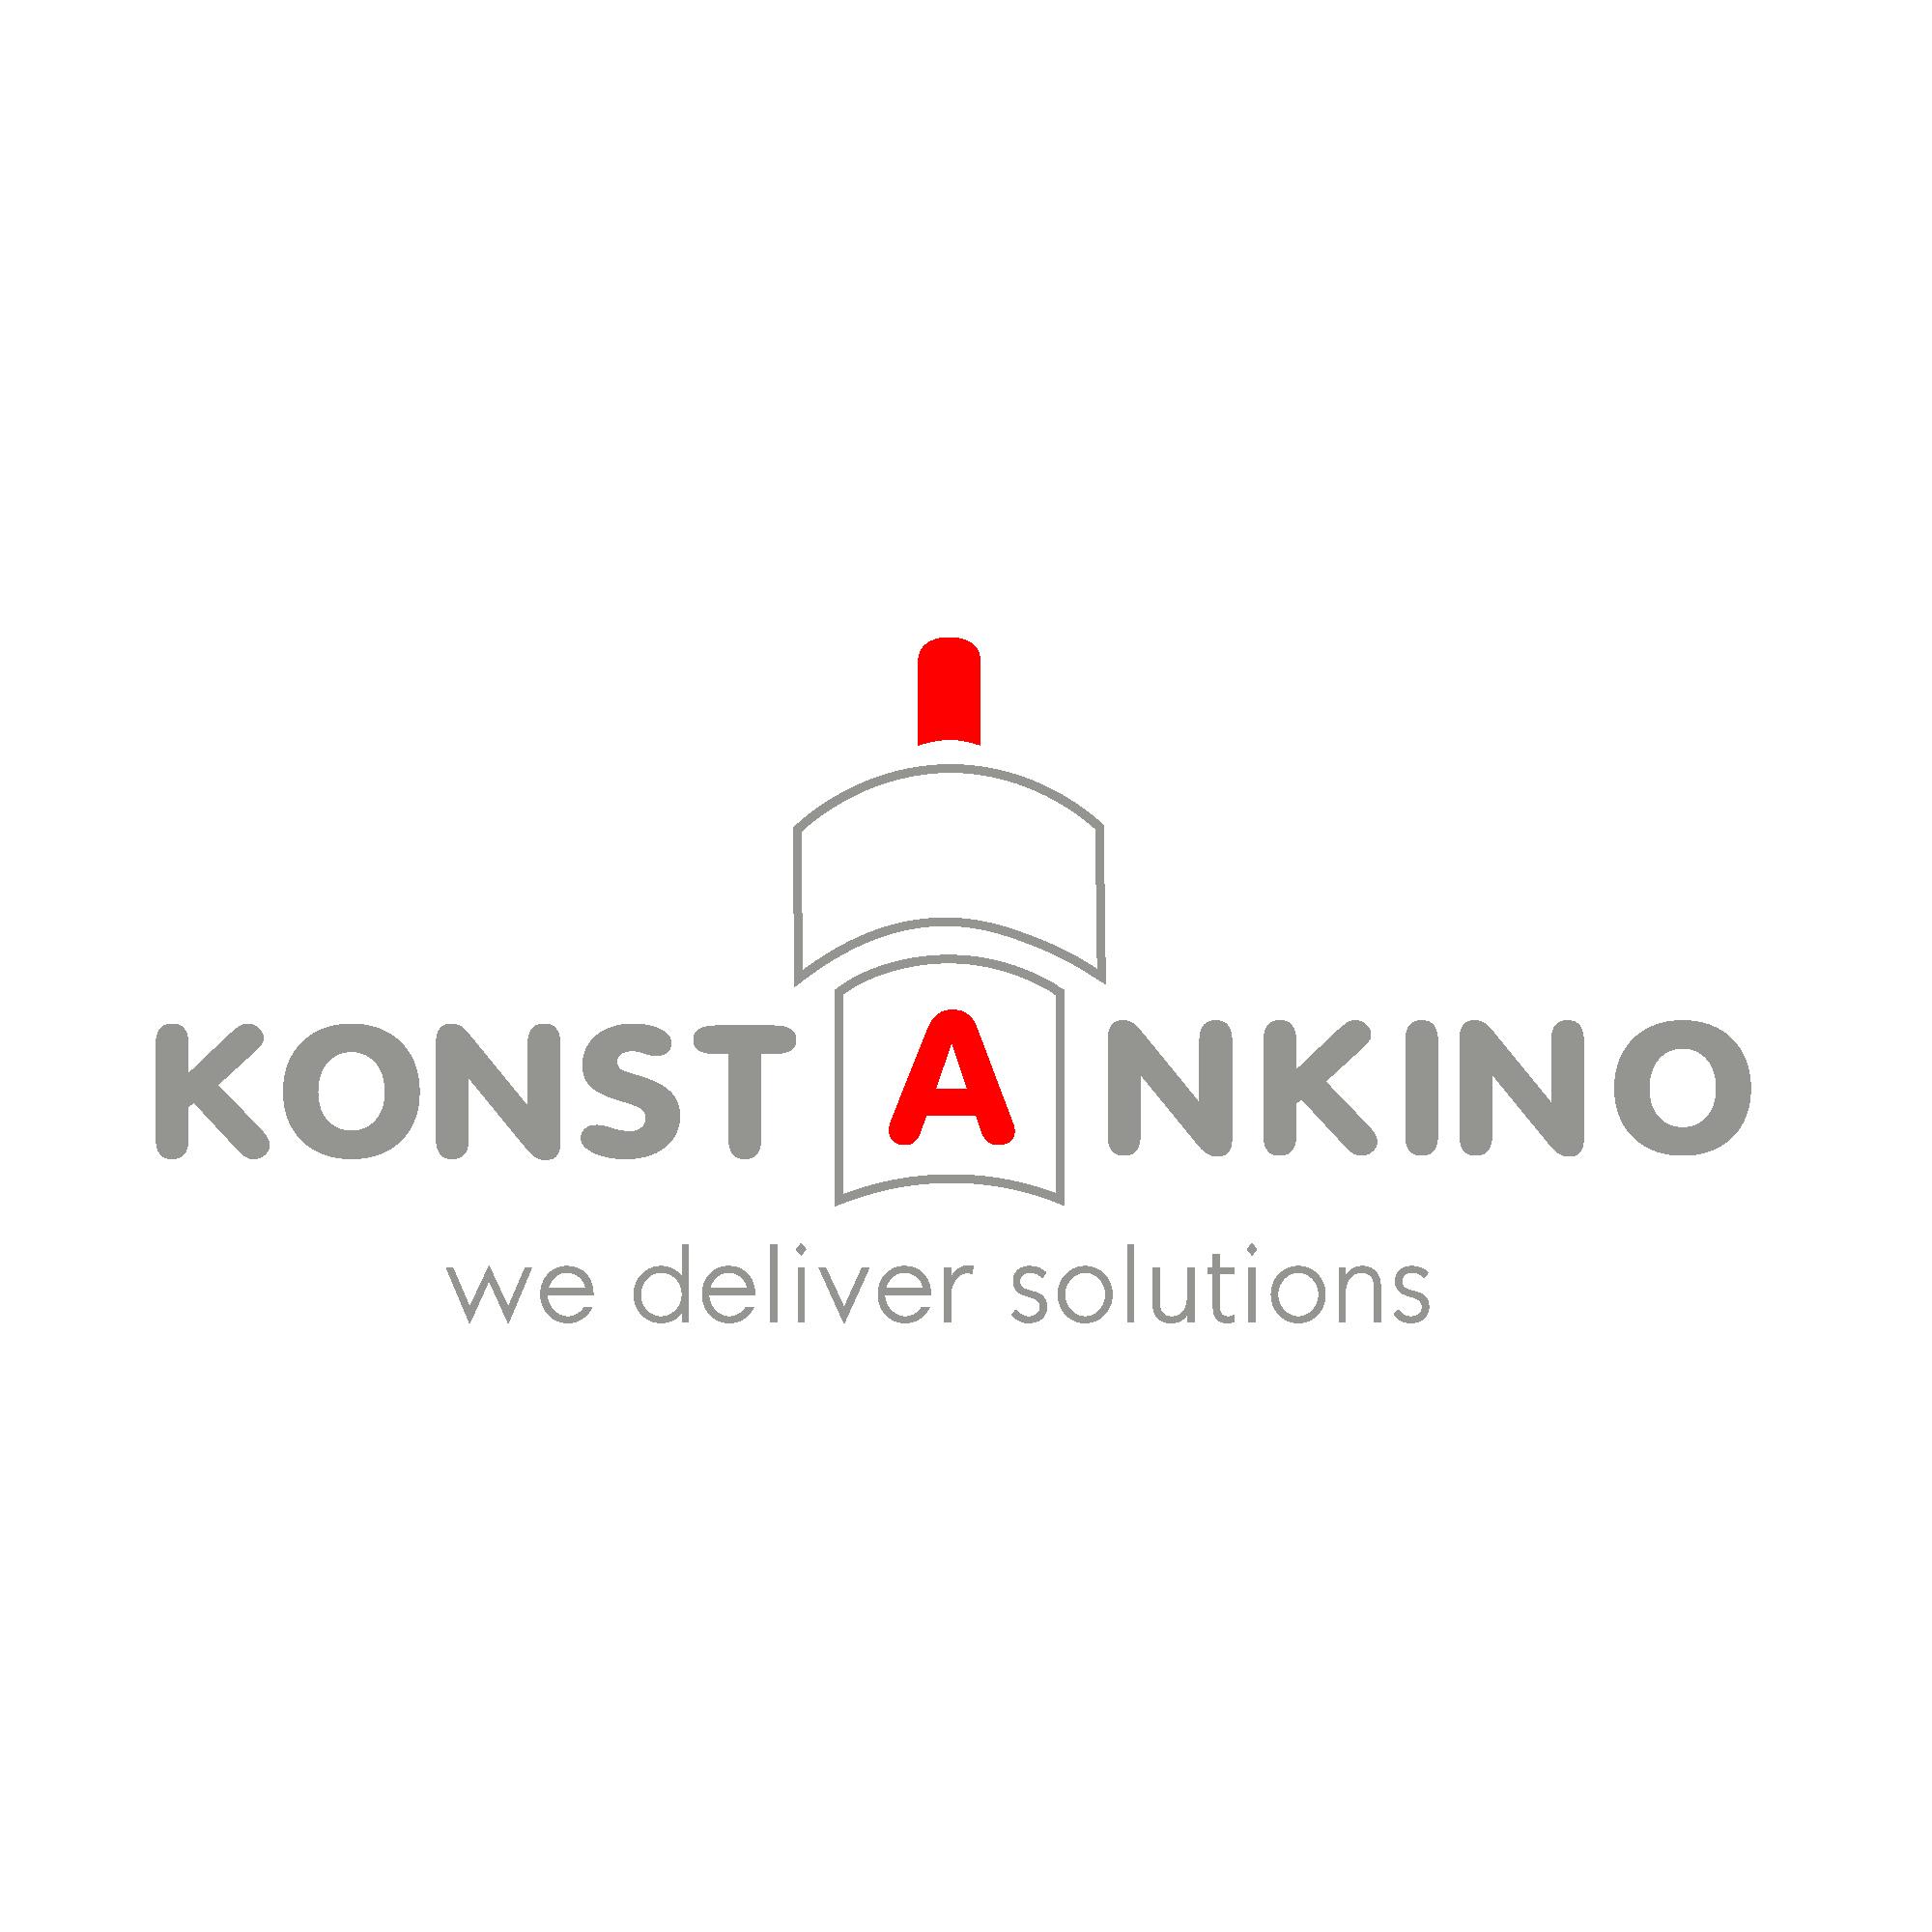 Фото Логотип, фирменный знак, нейминг 4